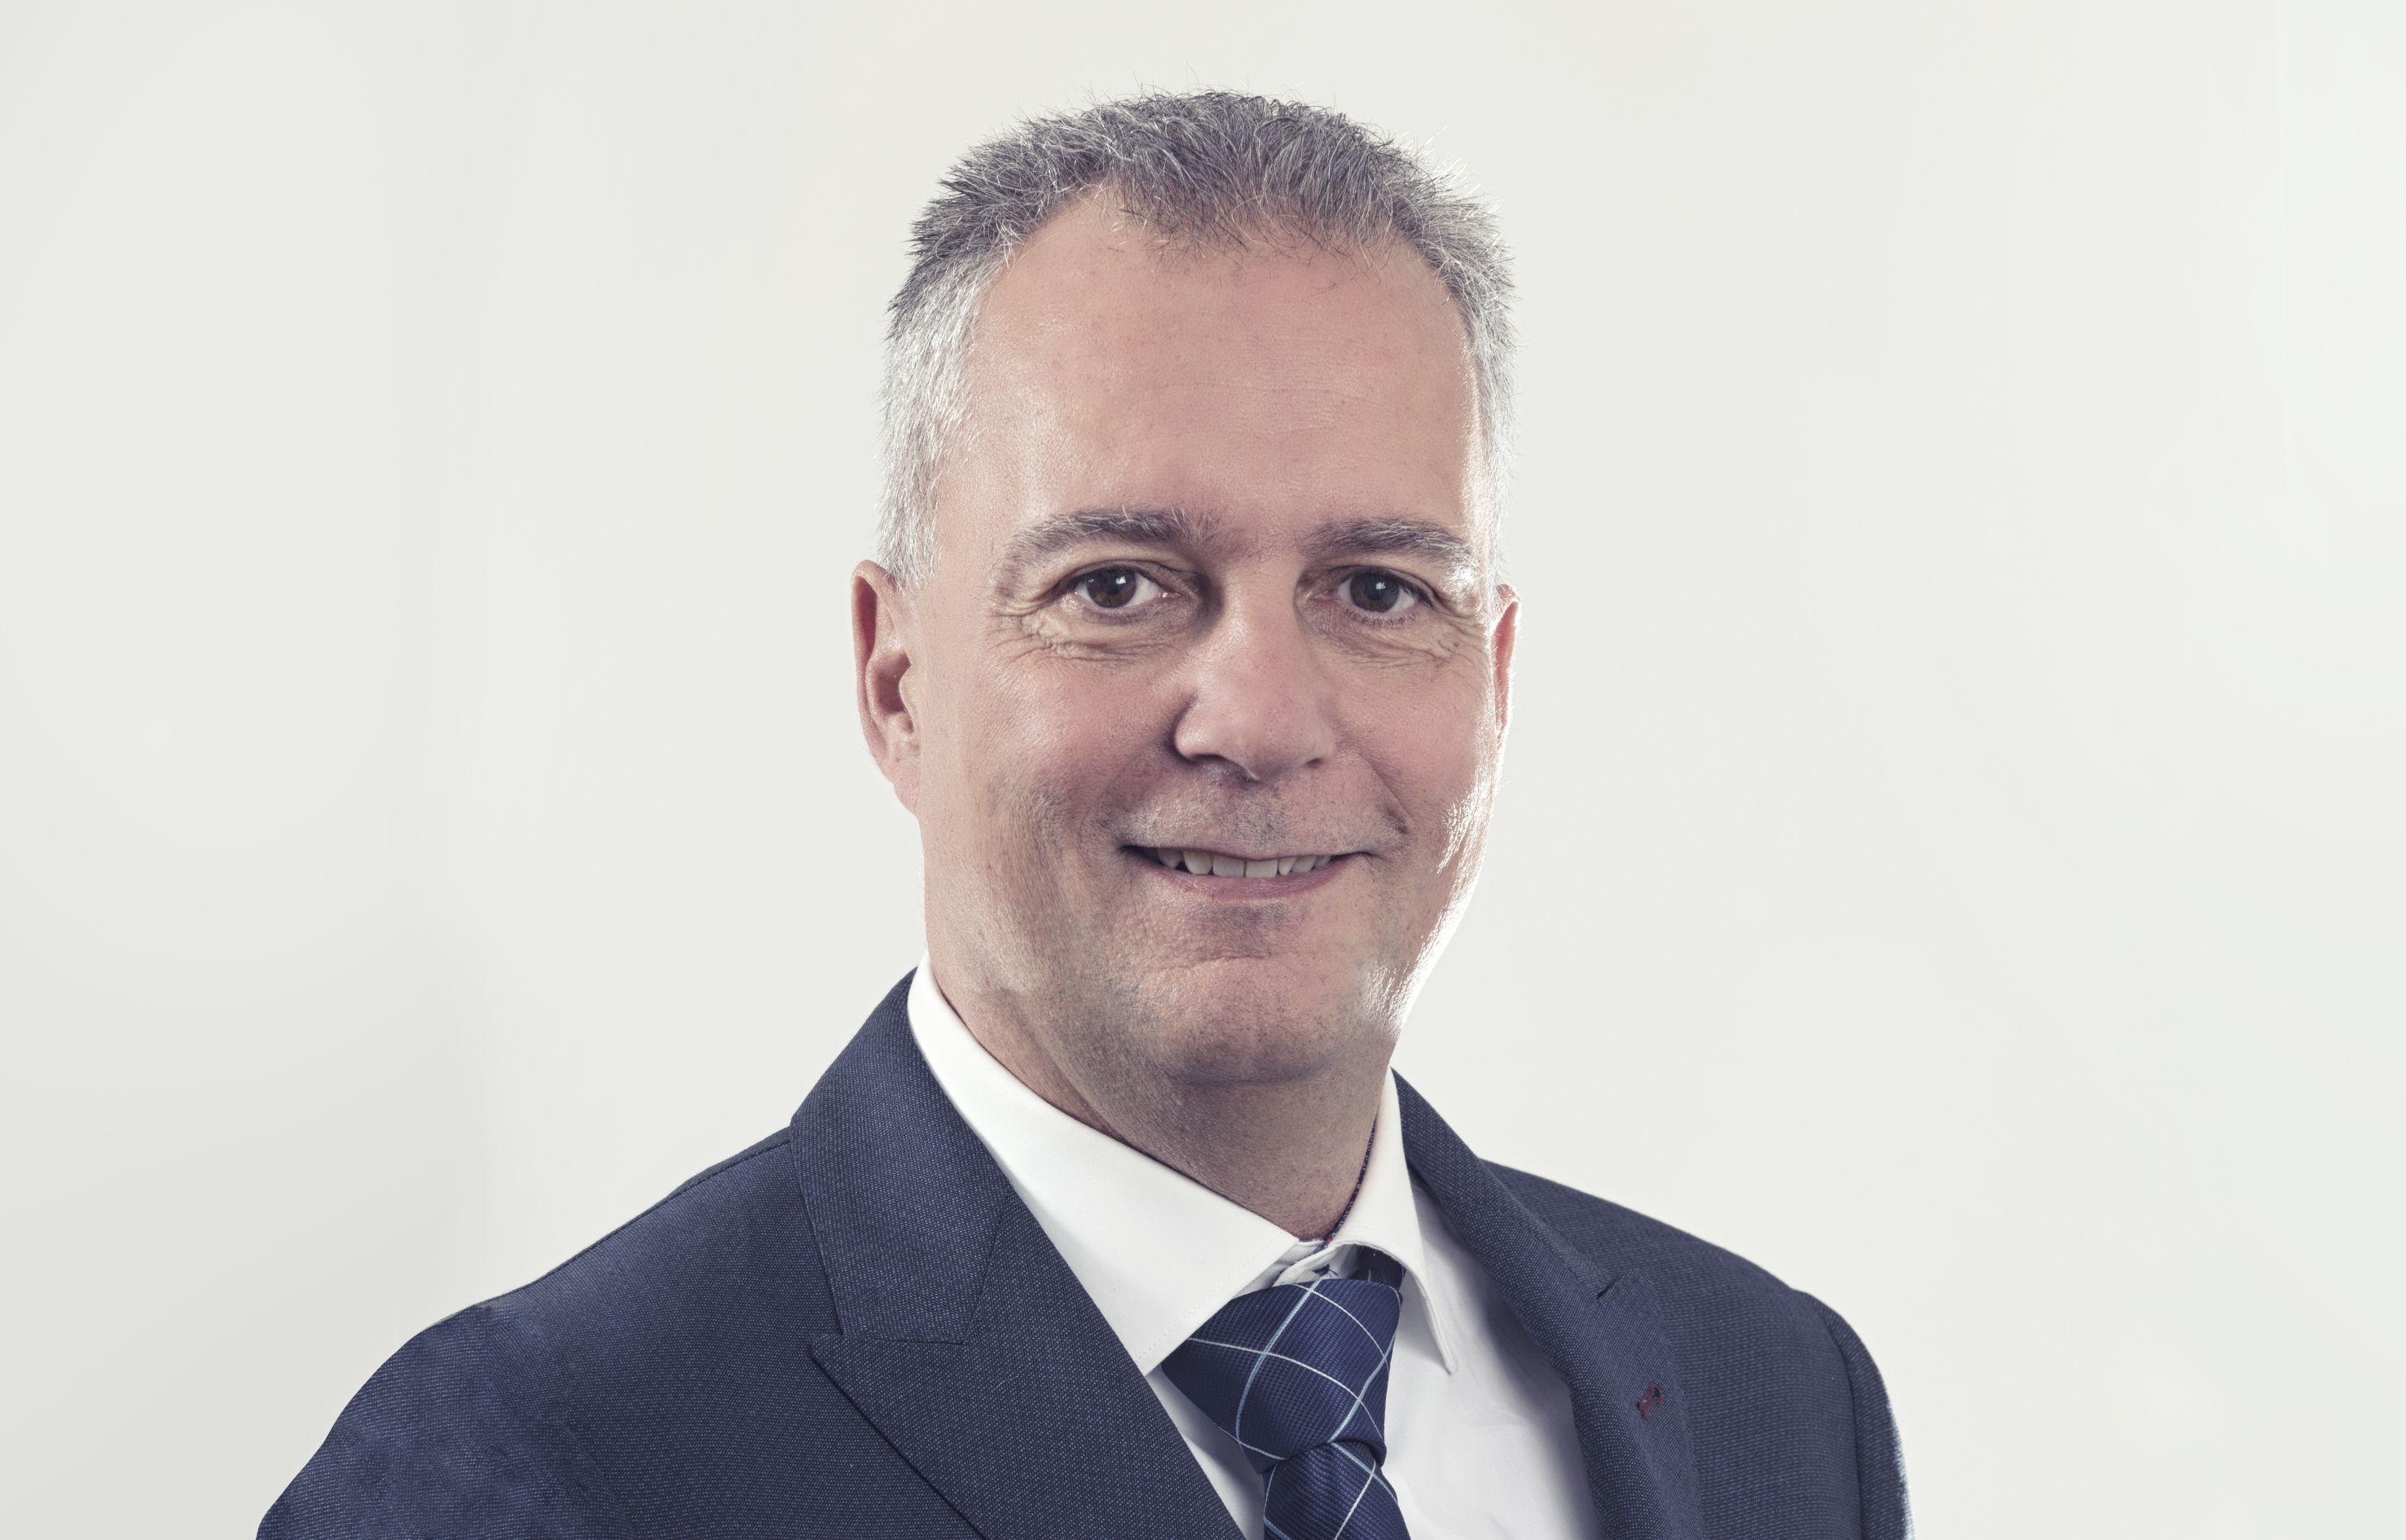 Andreas Markerink